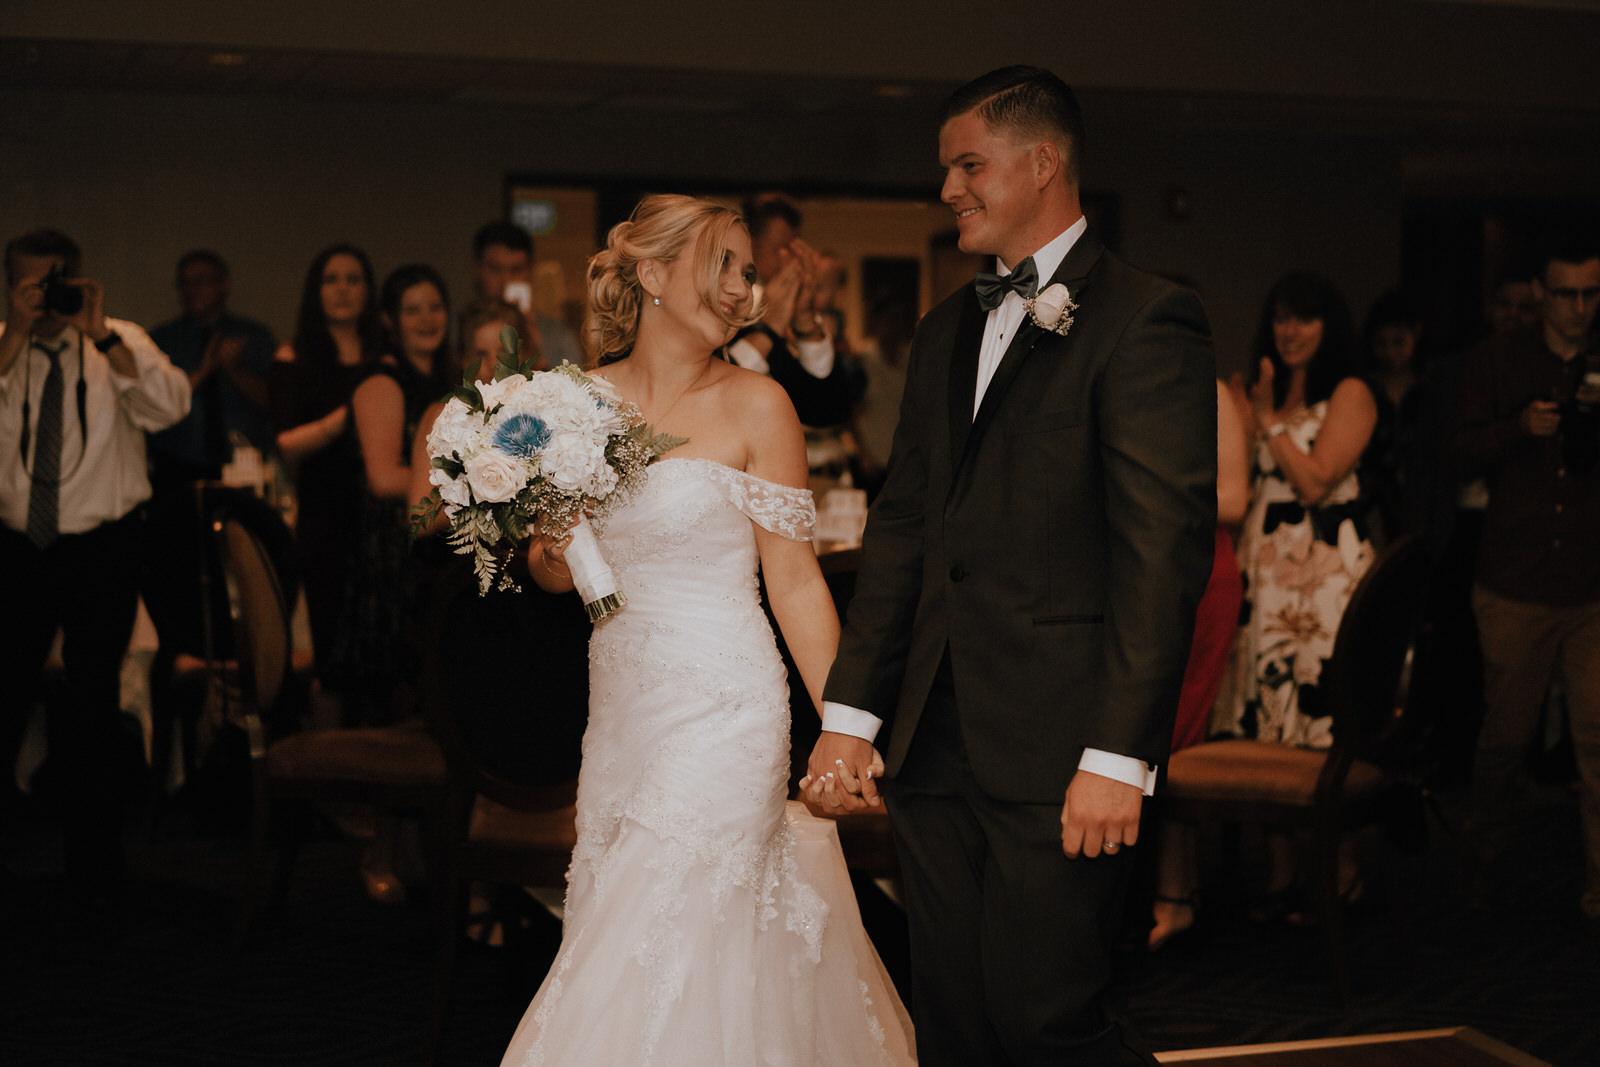 The Landings- fort myers wedding photographer-Nick and Jessica-480.jpg